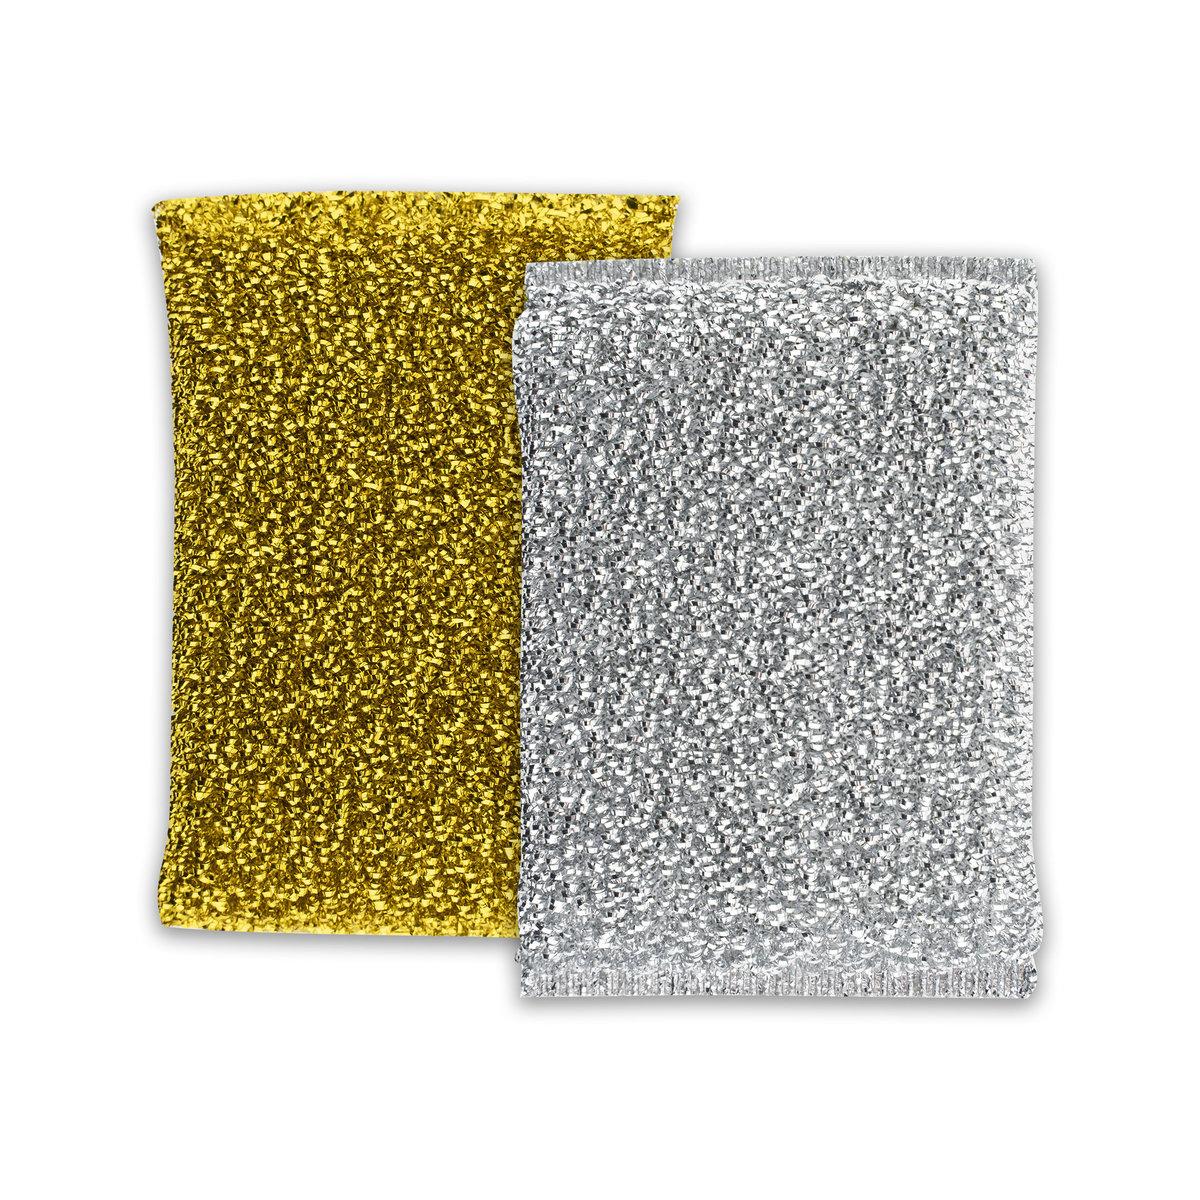 mesh sponge 2 pcs set - SSM2